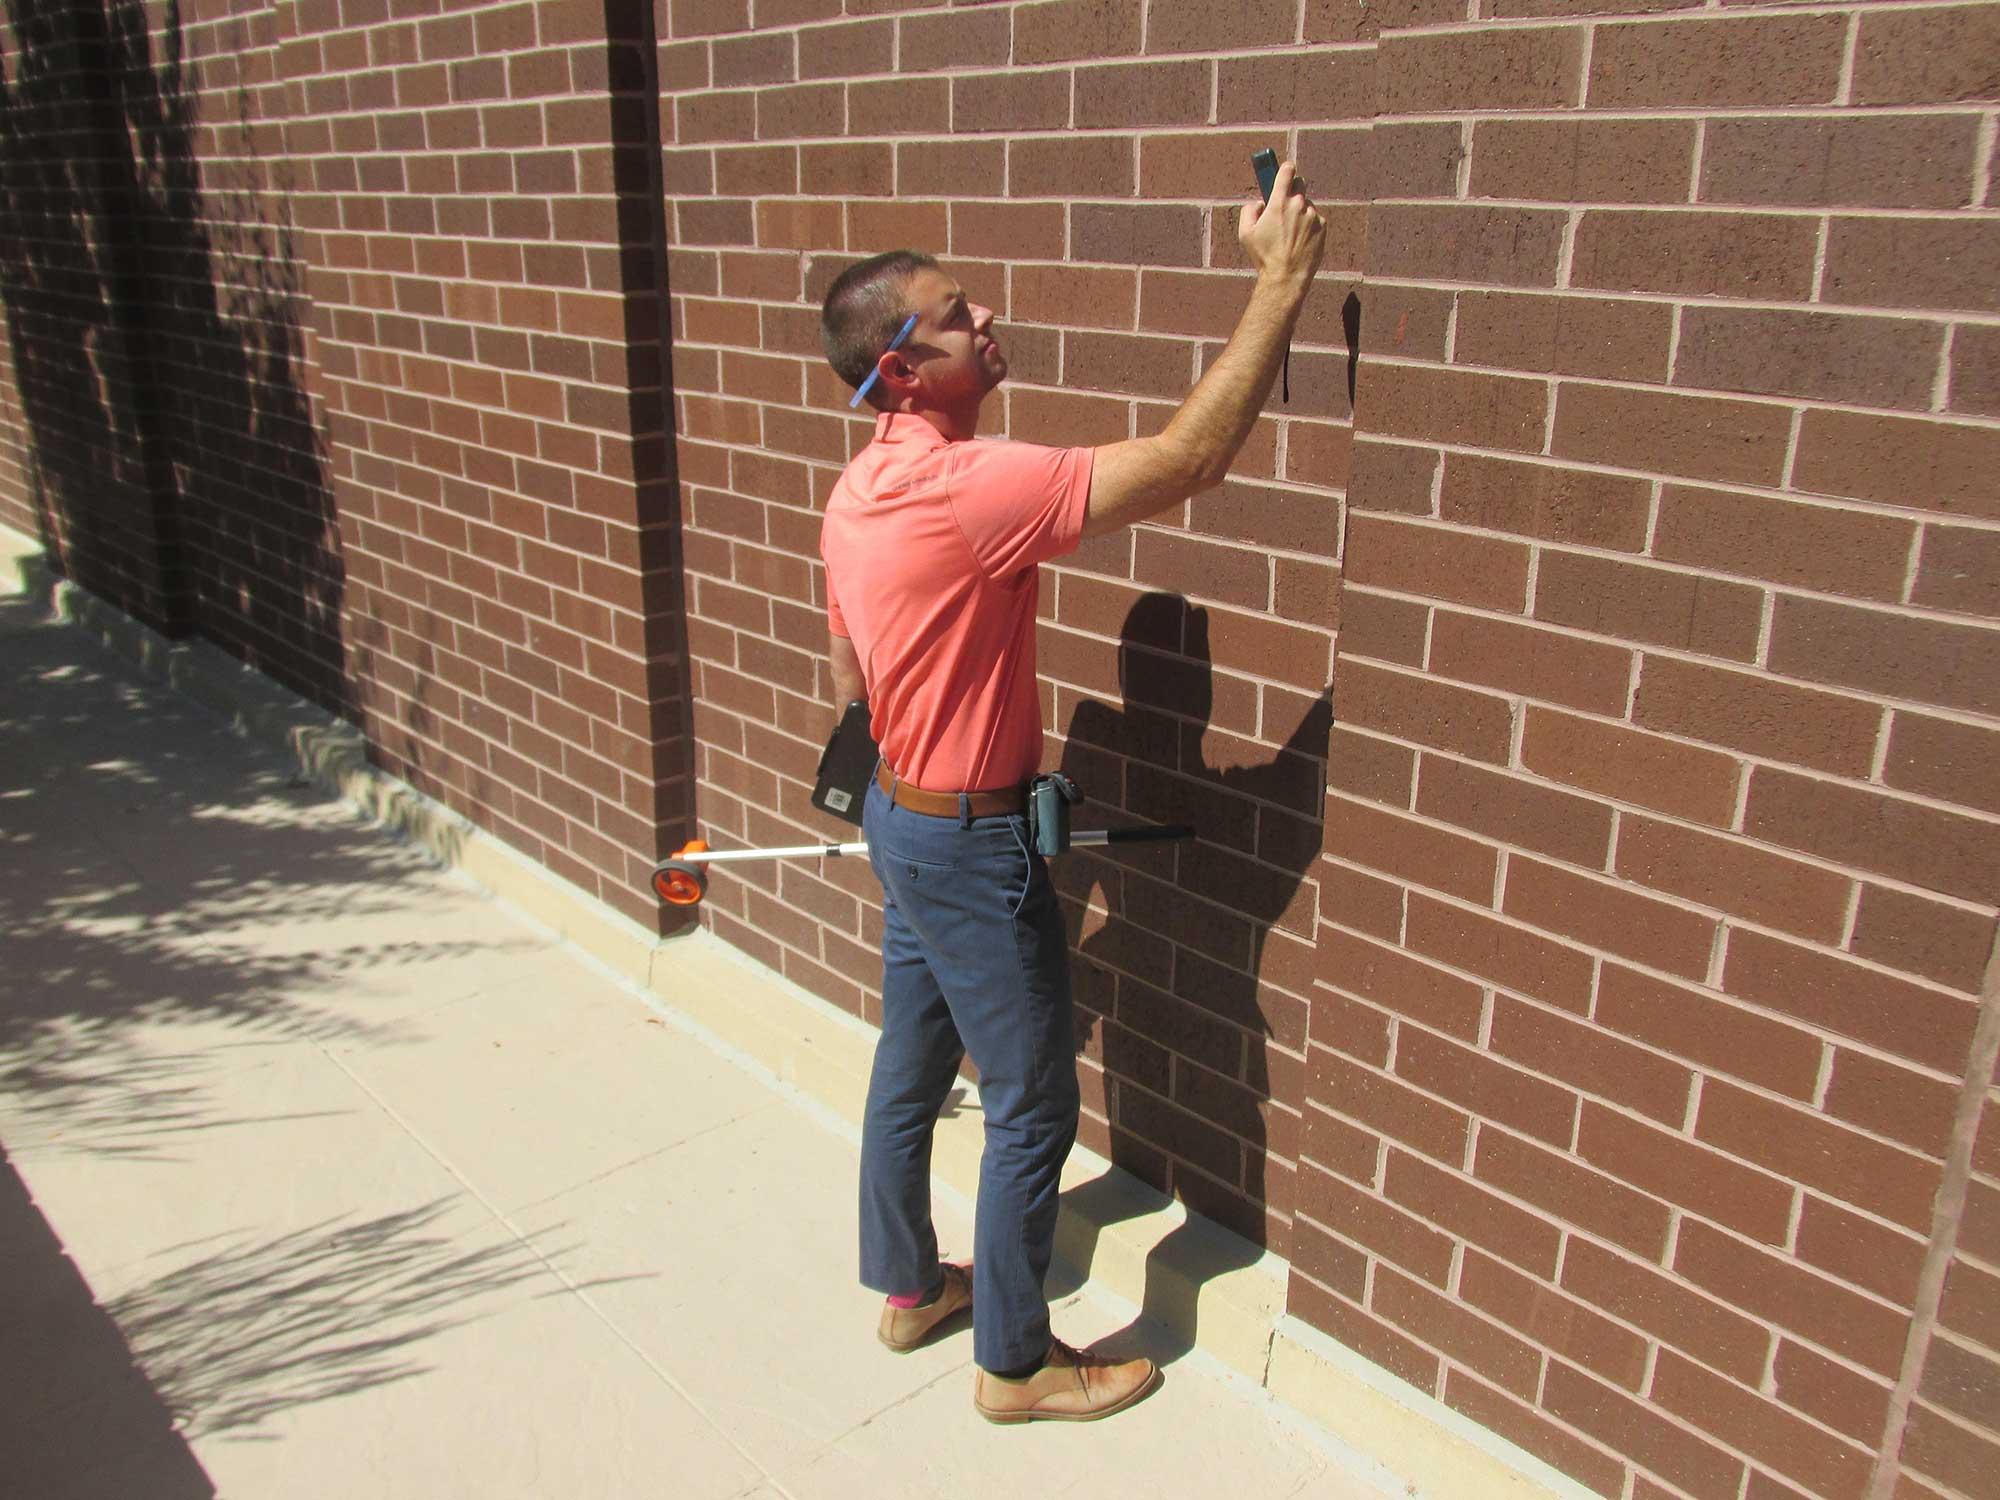 gentleman taking pictures of brick wall